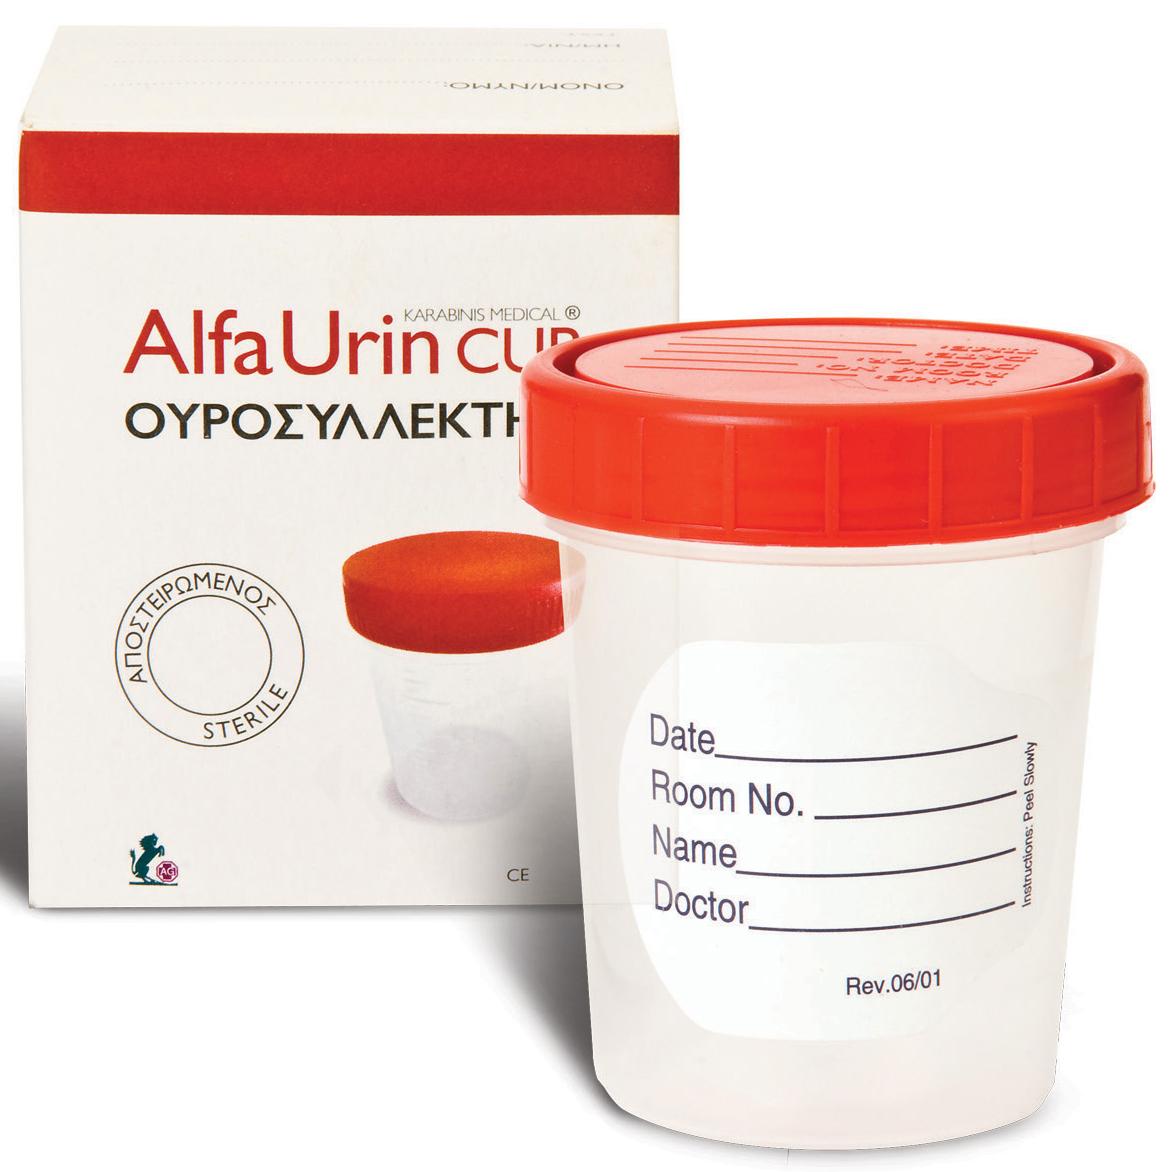 Alfa Urine Cup Ουροσυλλέκτης, Αποστειρωμένος Ουροσυλλέκτης για Ανάλυση & Καλλιέργεια Ούρων 1τμχ